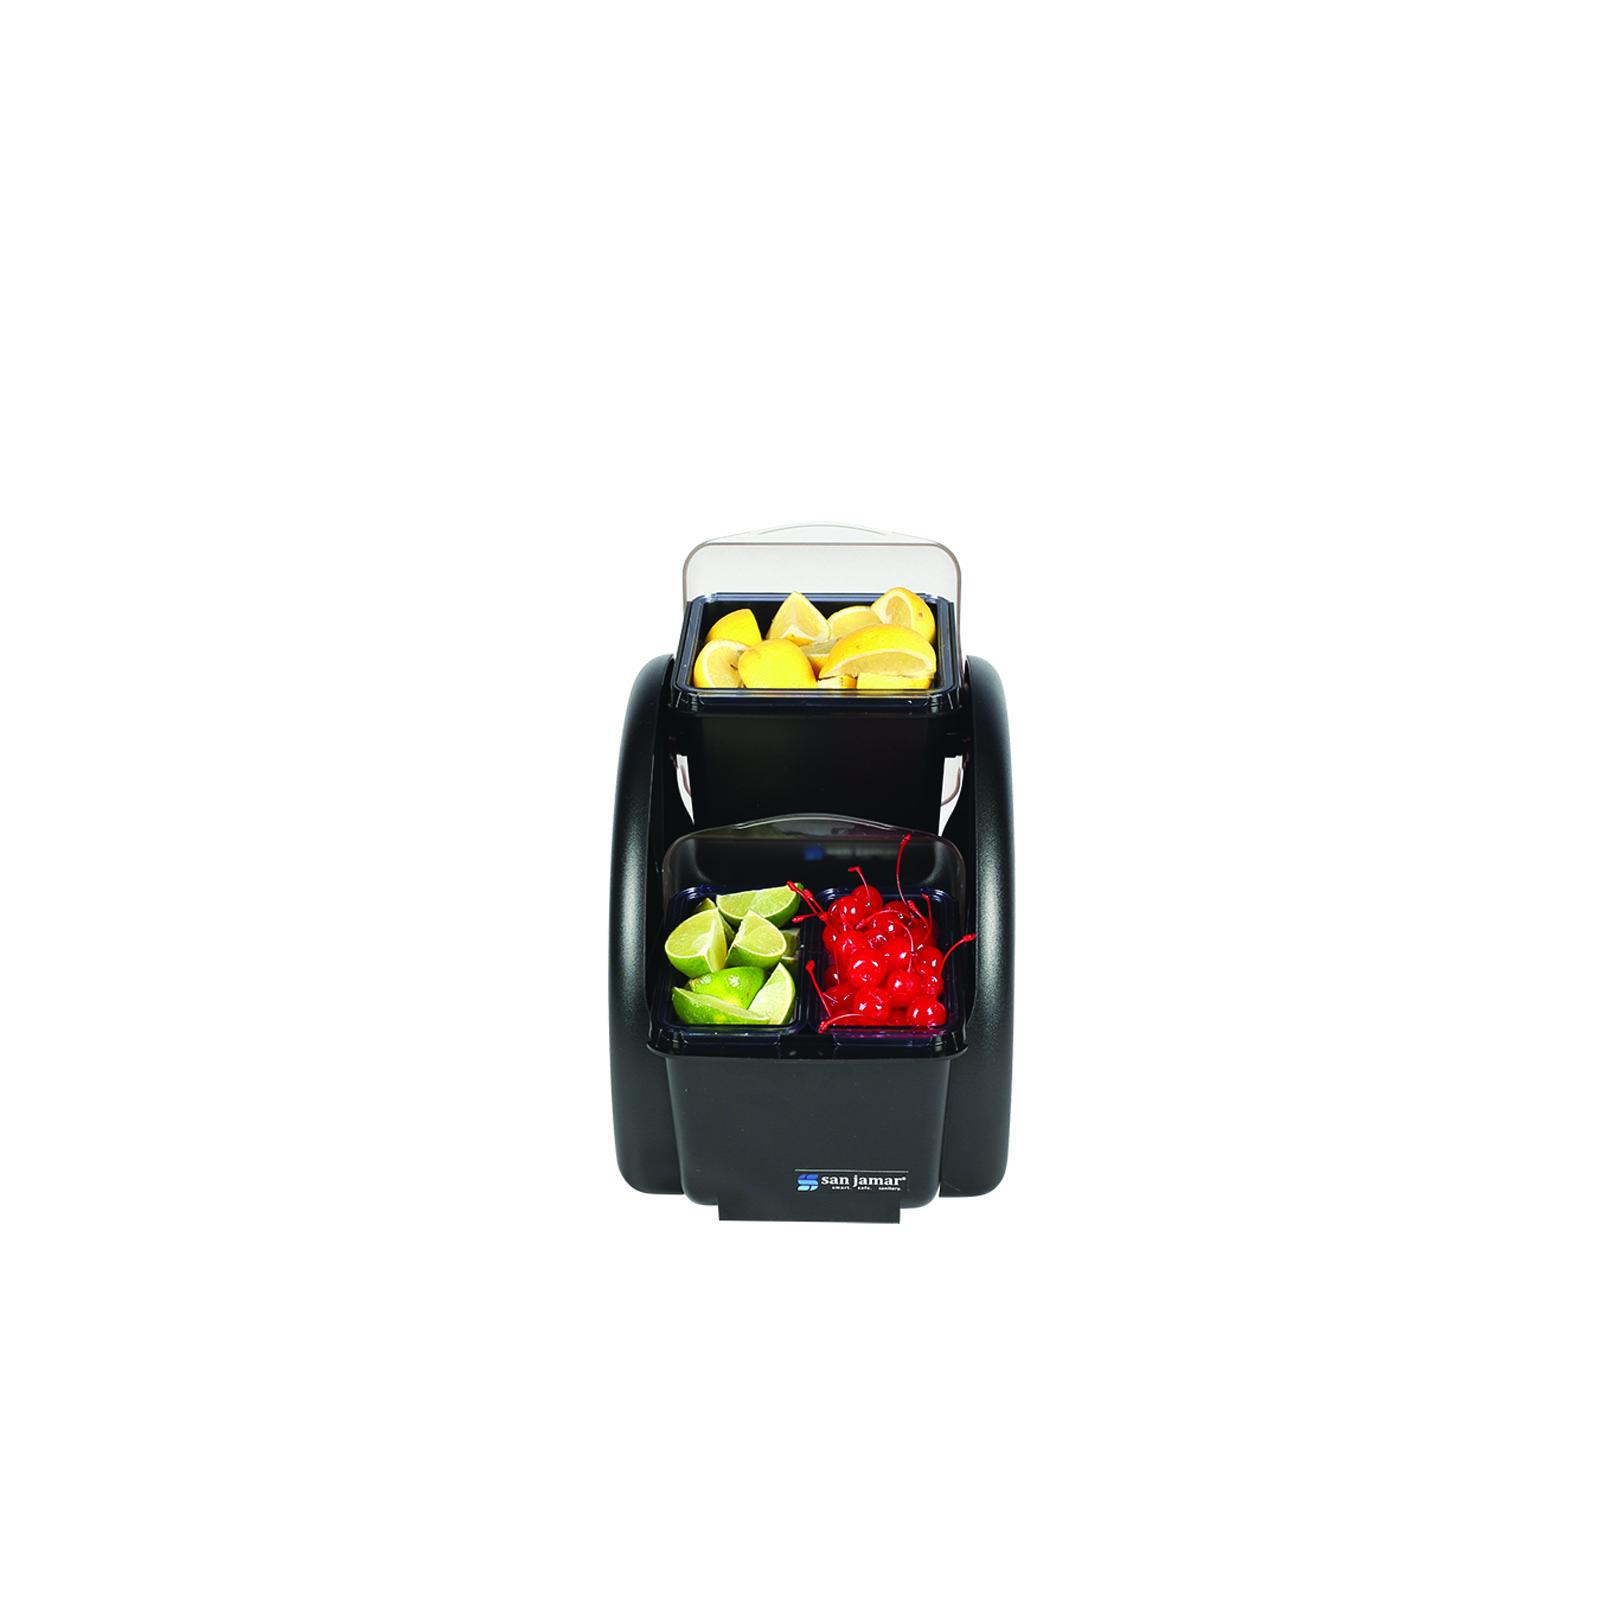 San Jamar BDS2203 bar condiment holder